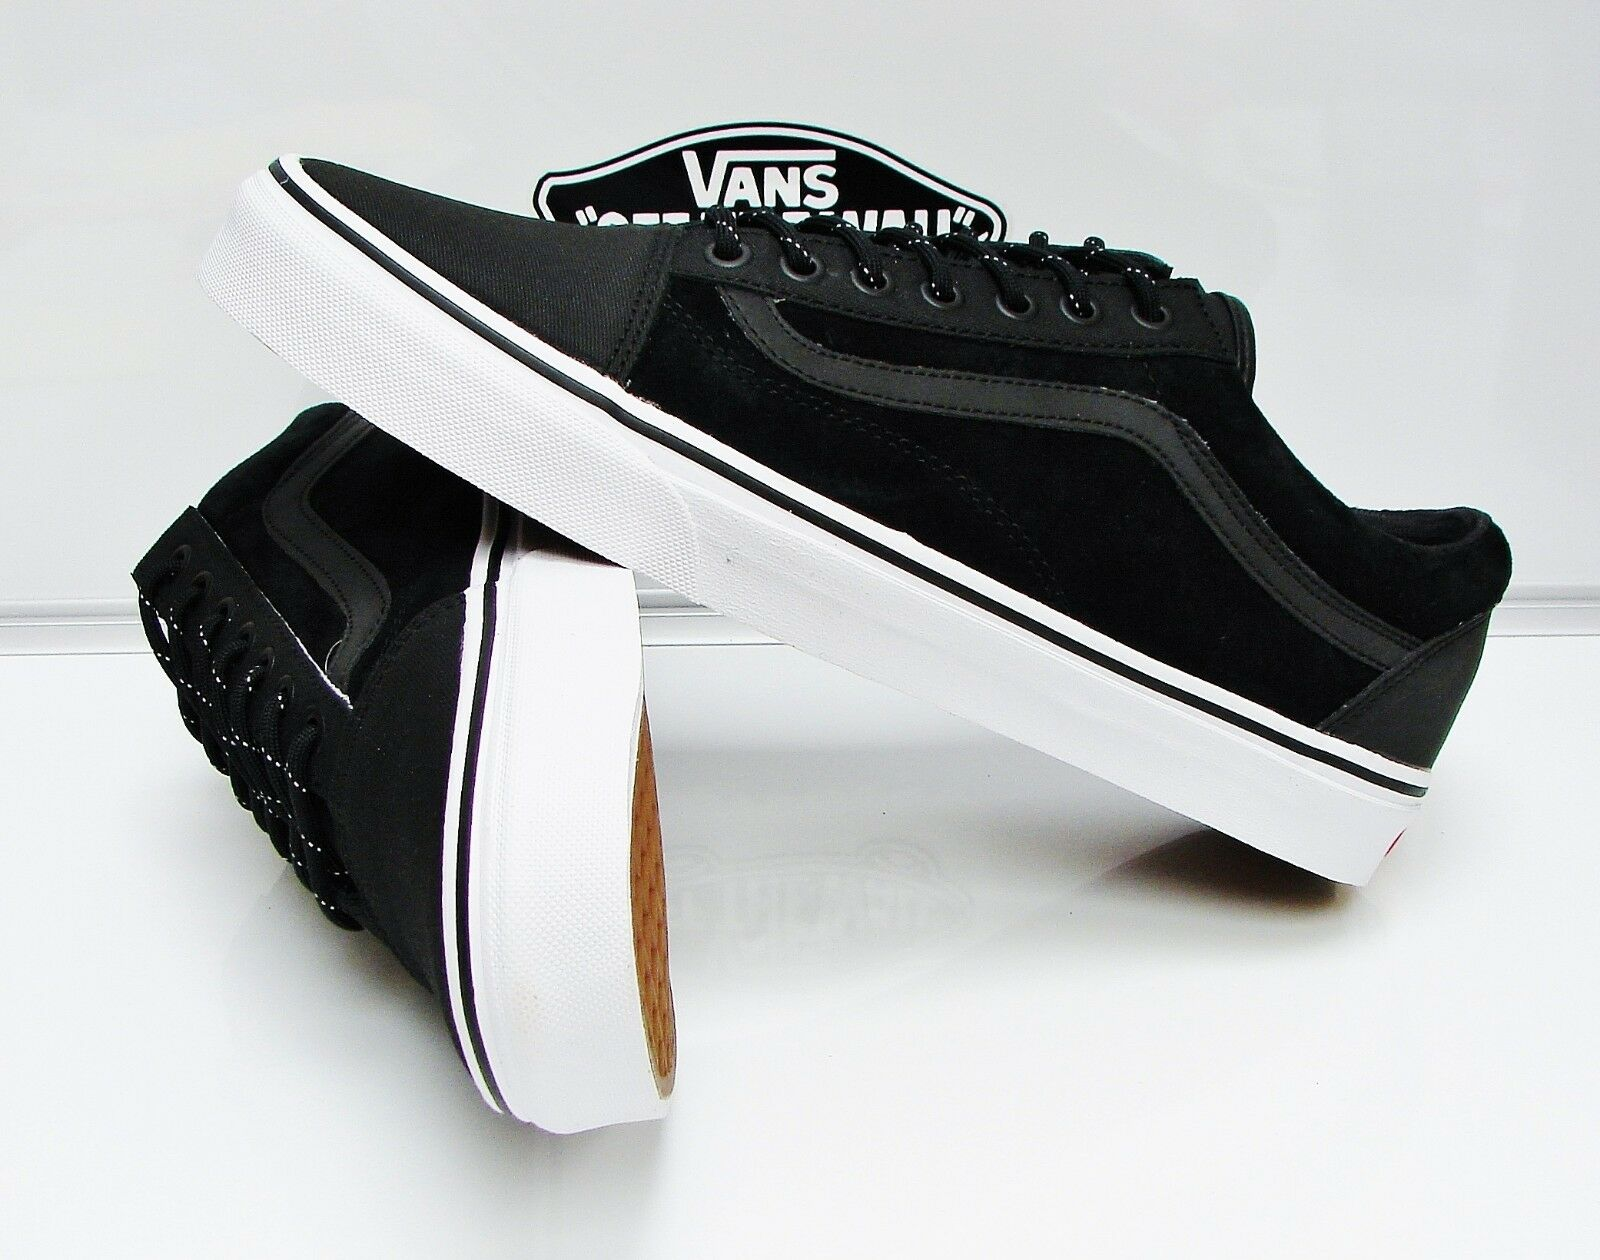 4bac56c18f2c VANS X Tyler The Creator Scuba Donut Golf Wang Skate Shoe - men s size 9 DS